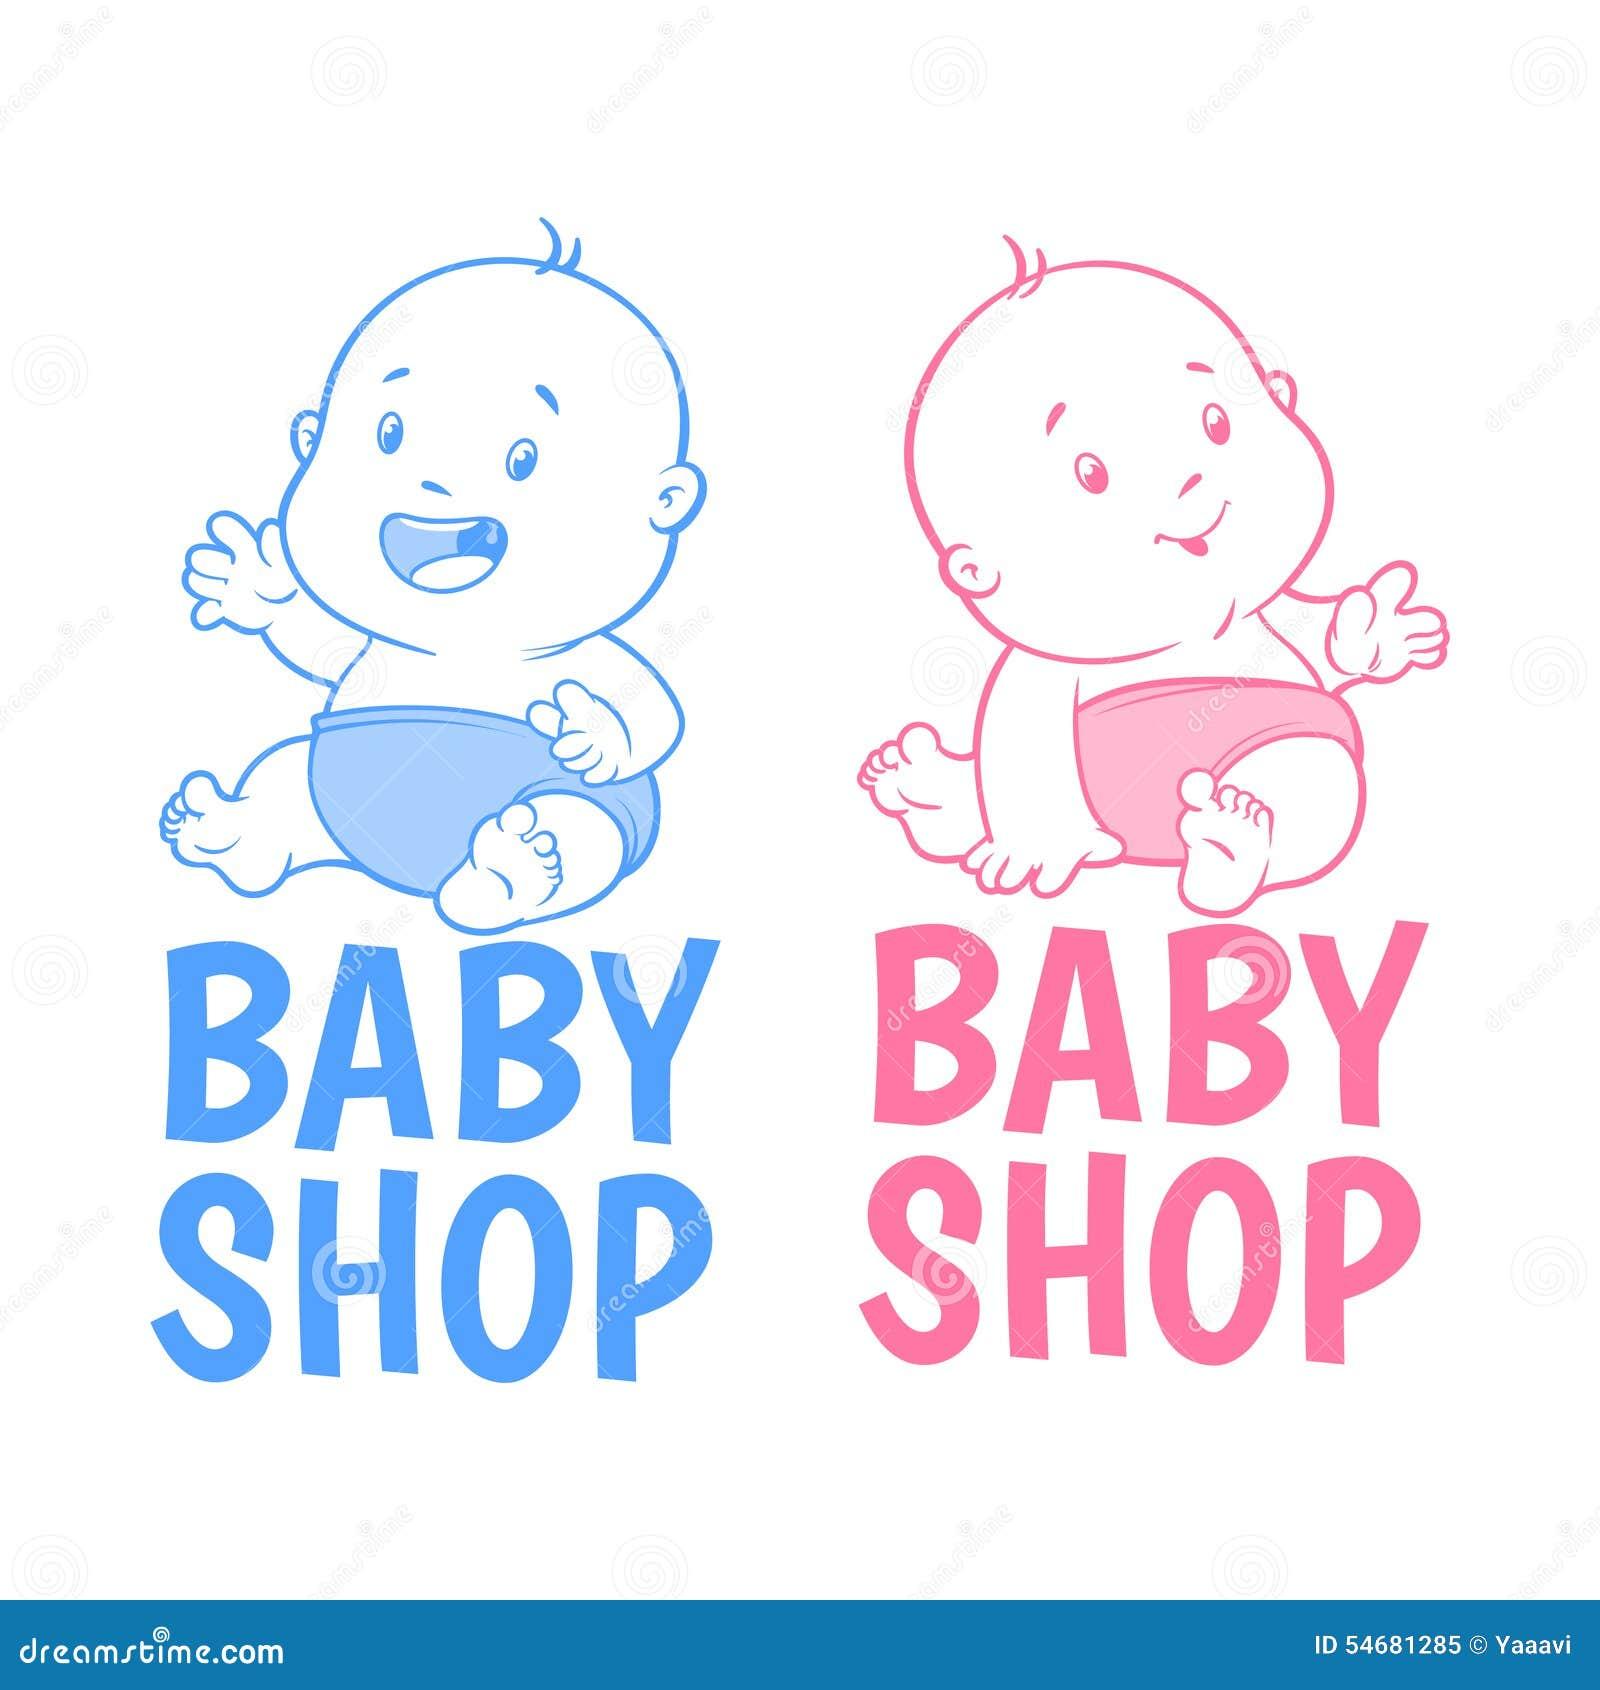 two baby shop logo stock vector image 54681285 baby girl clip art images diaper baby girl clip art images looking fabulous